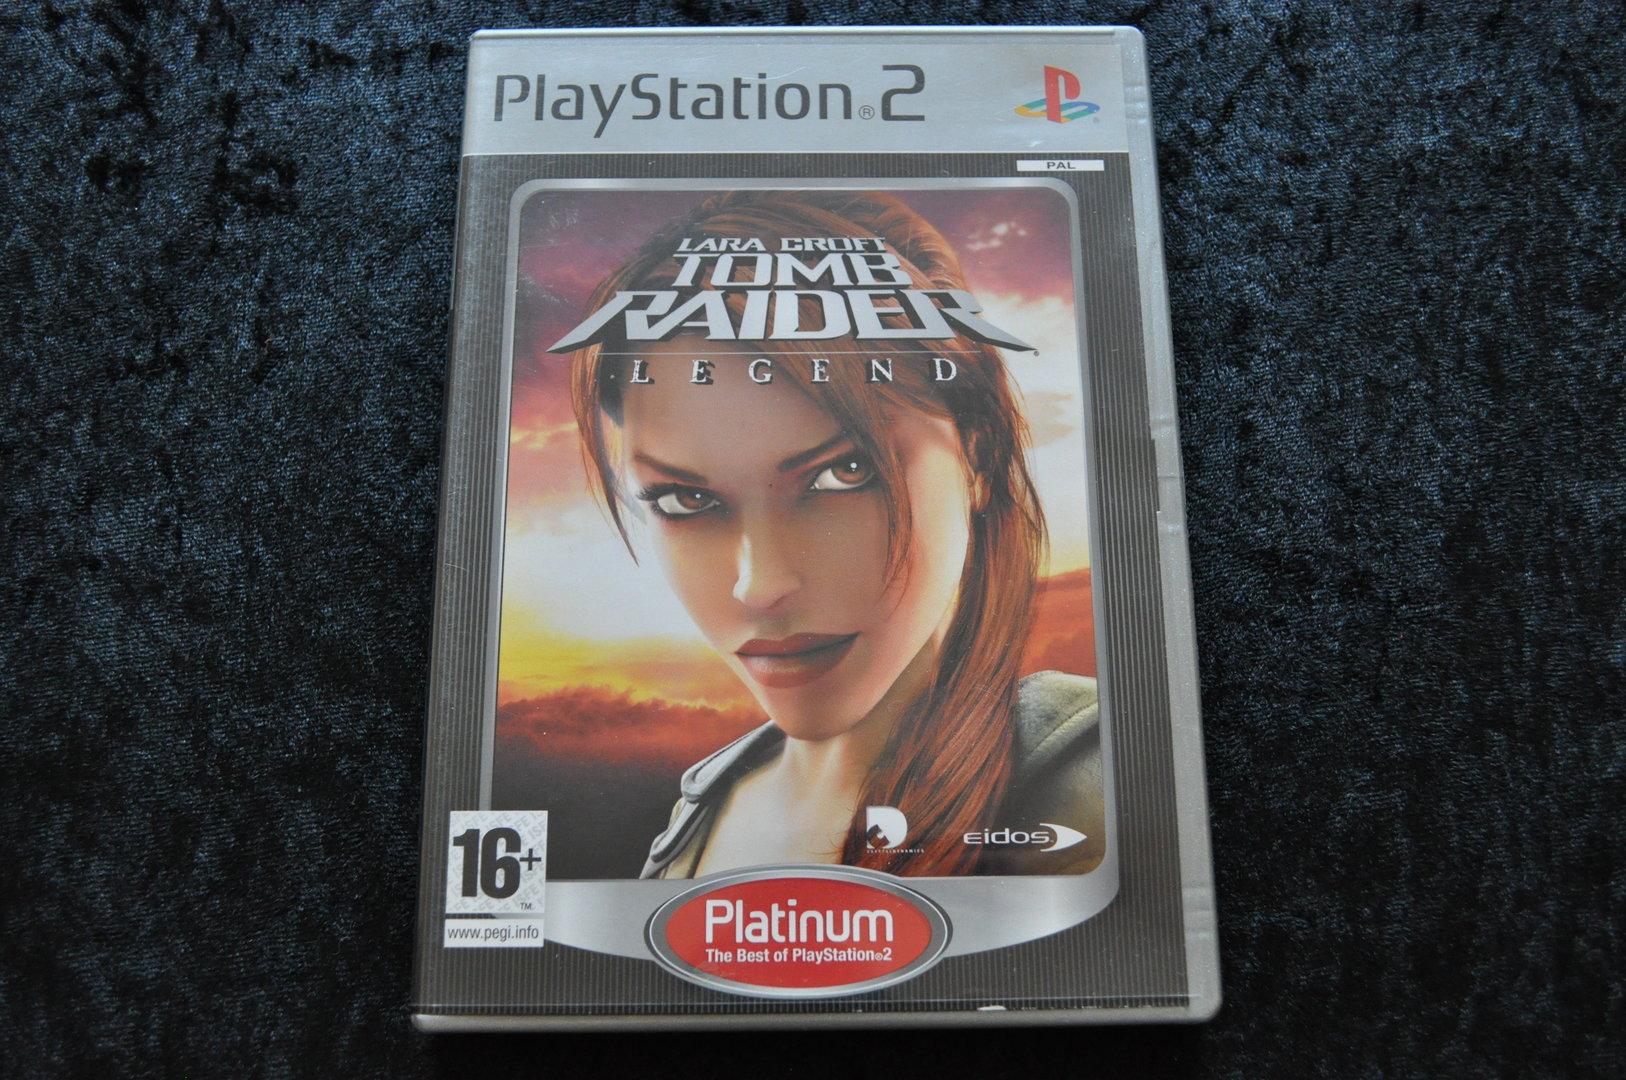 Lara Croft Tomb Raider Legend Platinum Playstation 2 Ps2